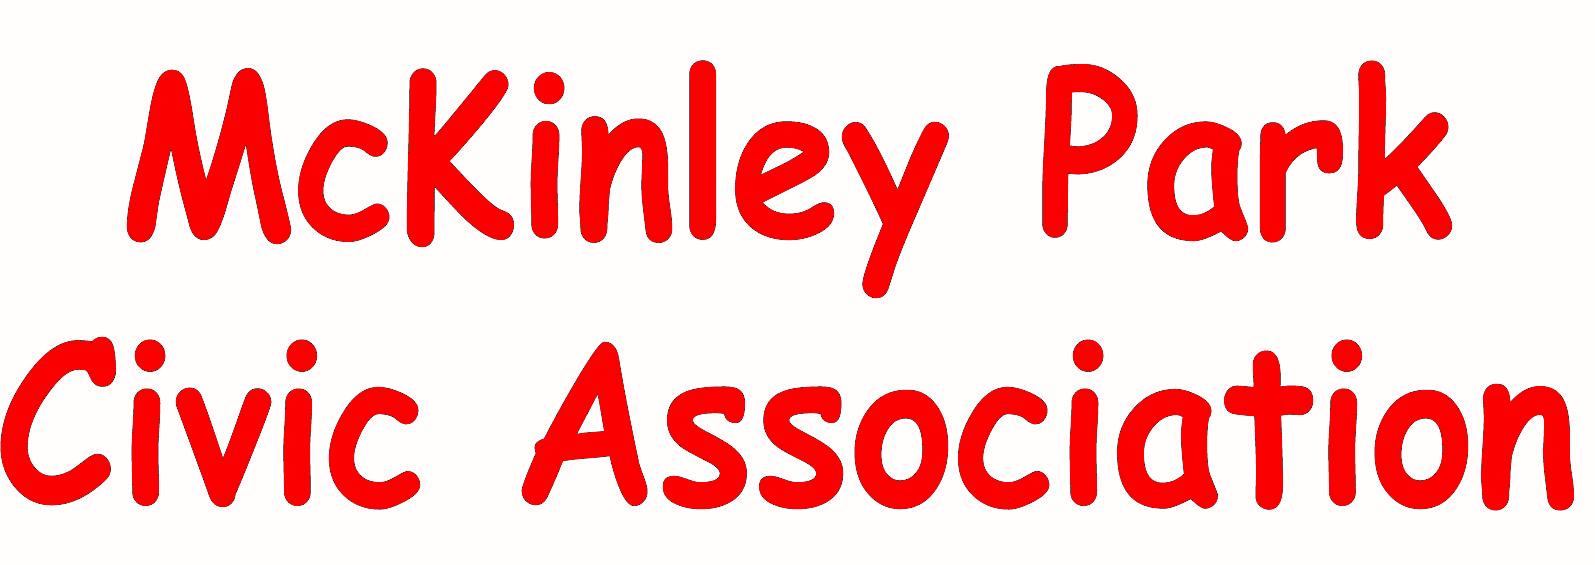 McKinley Park Civic Association